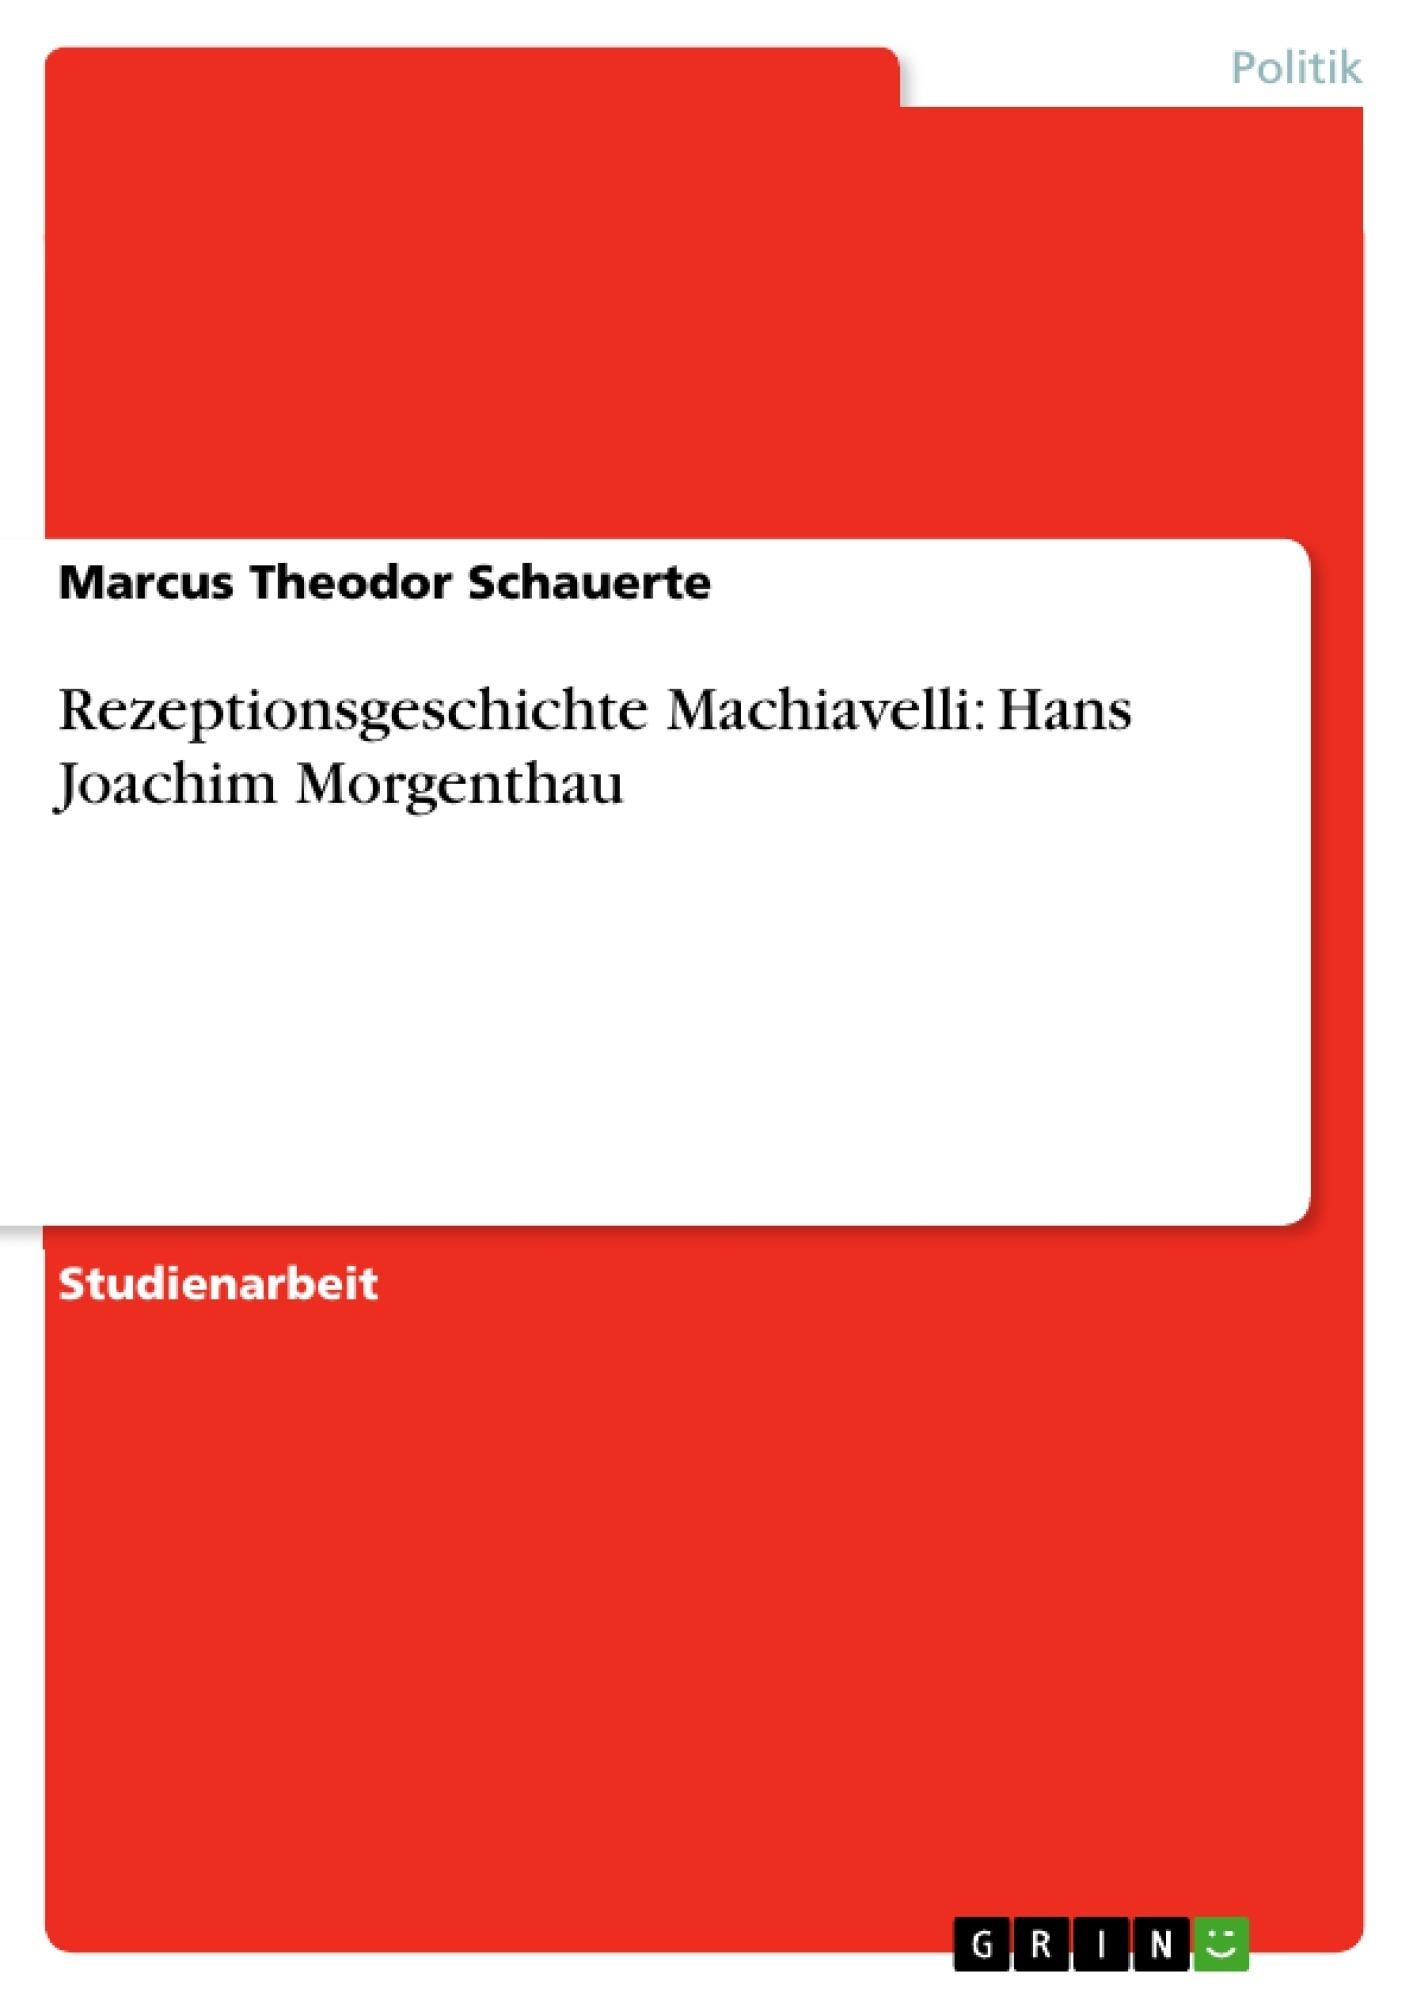 Titel: Rezeptionsgeschichte Machiavelli: Hans Joachim Morgenthau